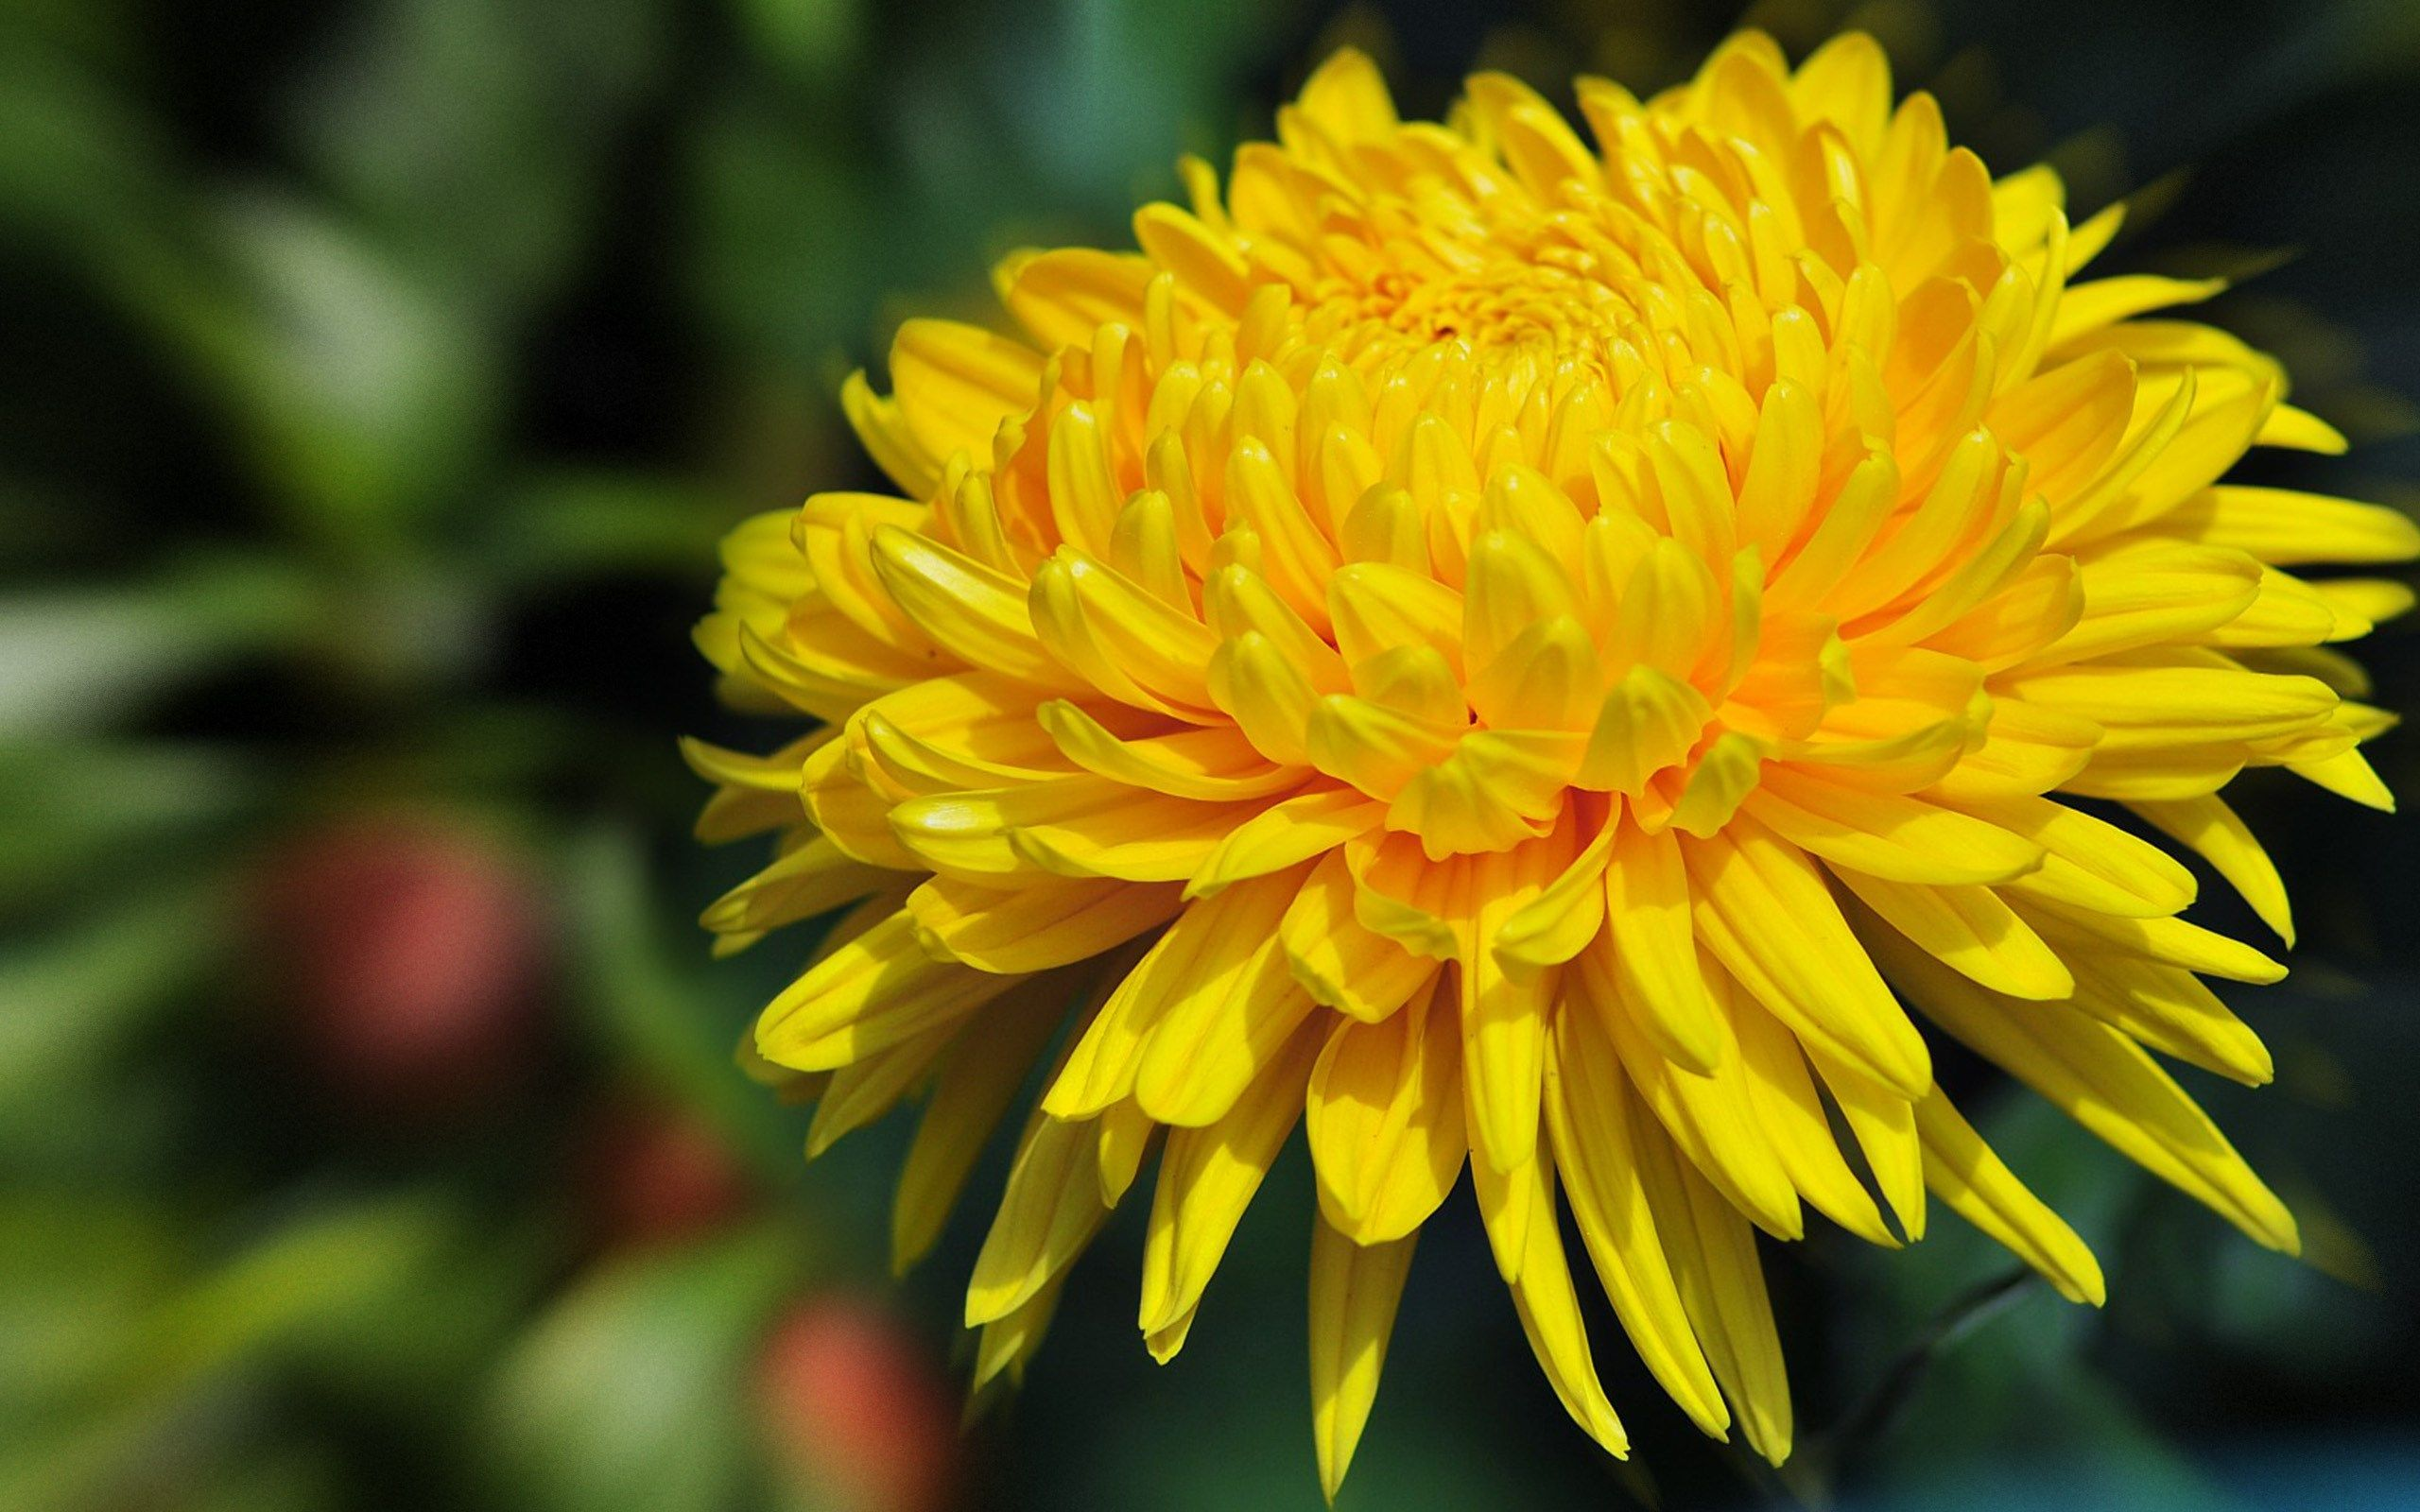 2560x1600 Free Awesome Flower Chrysanthemum Flower Pictures Chrysanthemum Chrysanthemum Flower